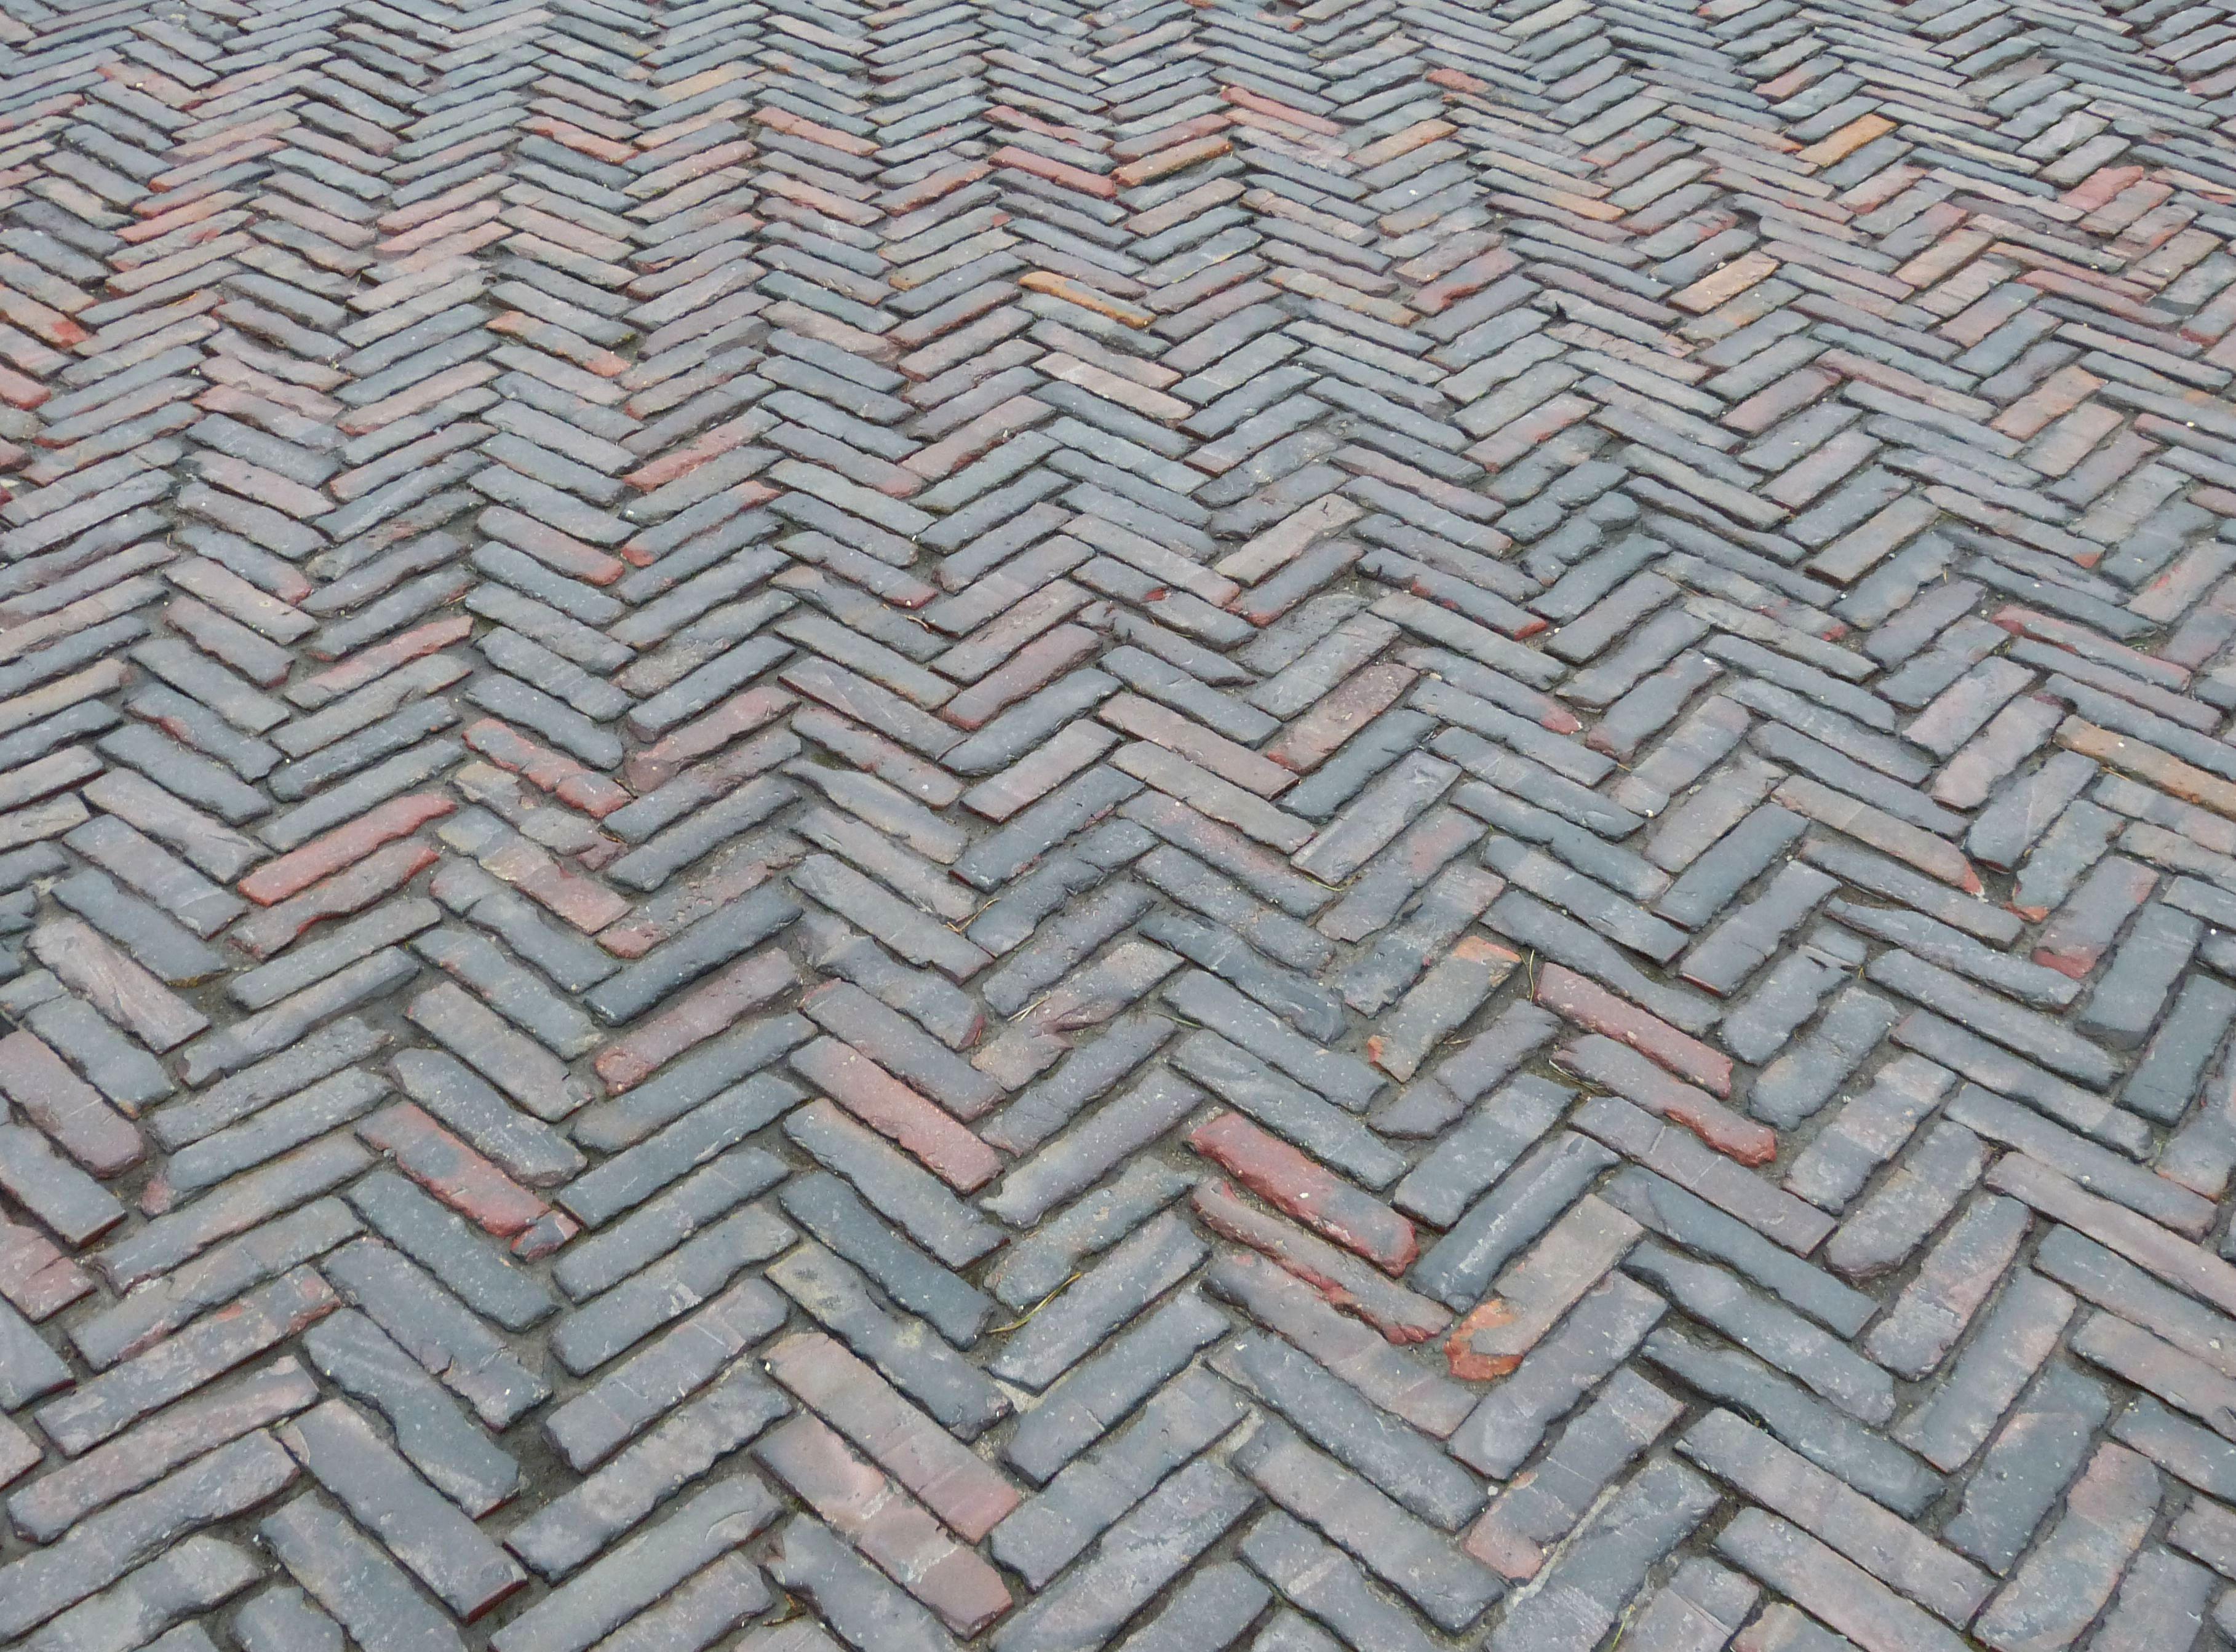 fotos gratis estructura la carretera suelo textura piso guijarro pared piedra pavimento patrn lnea azulejo ladrillo material parche